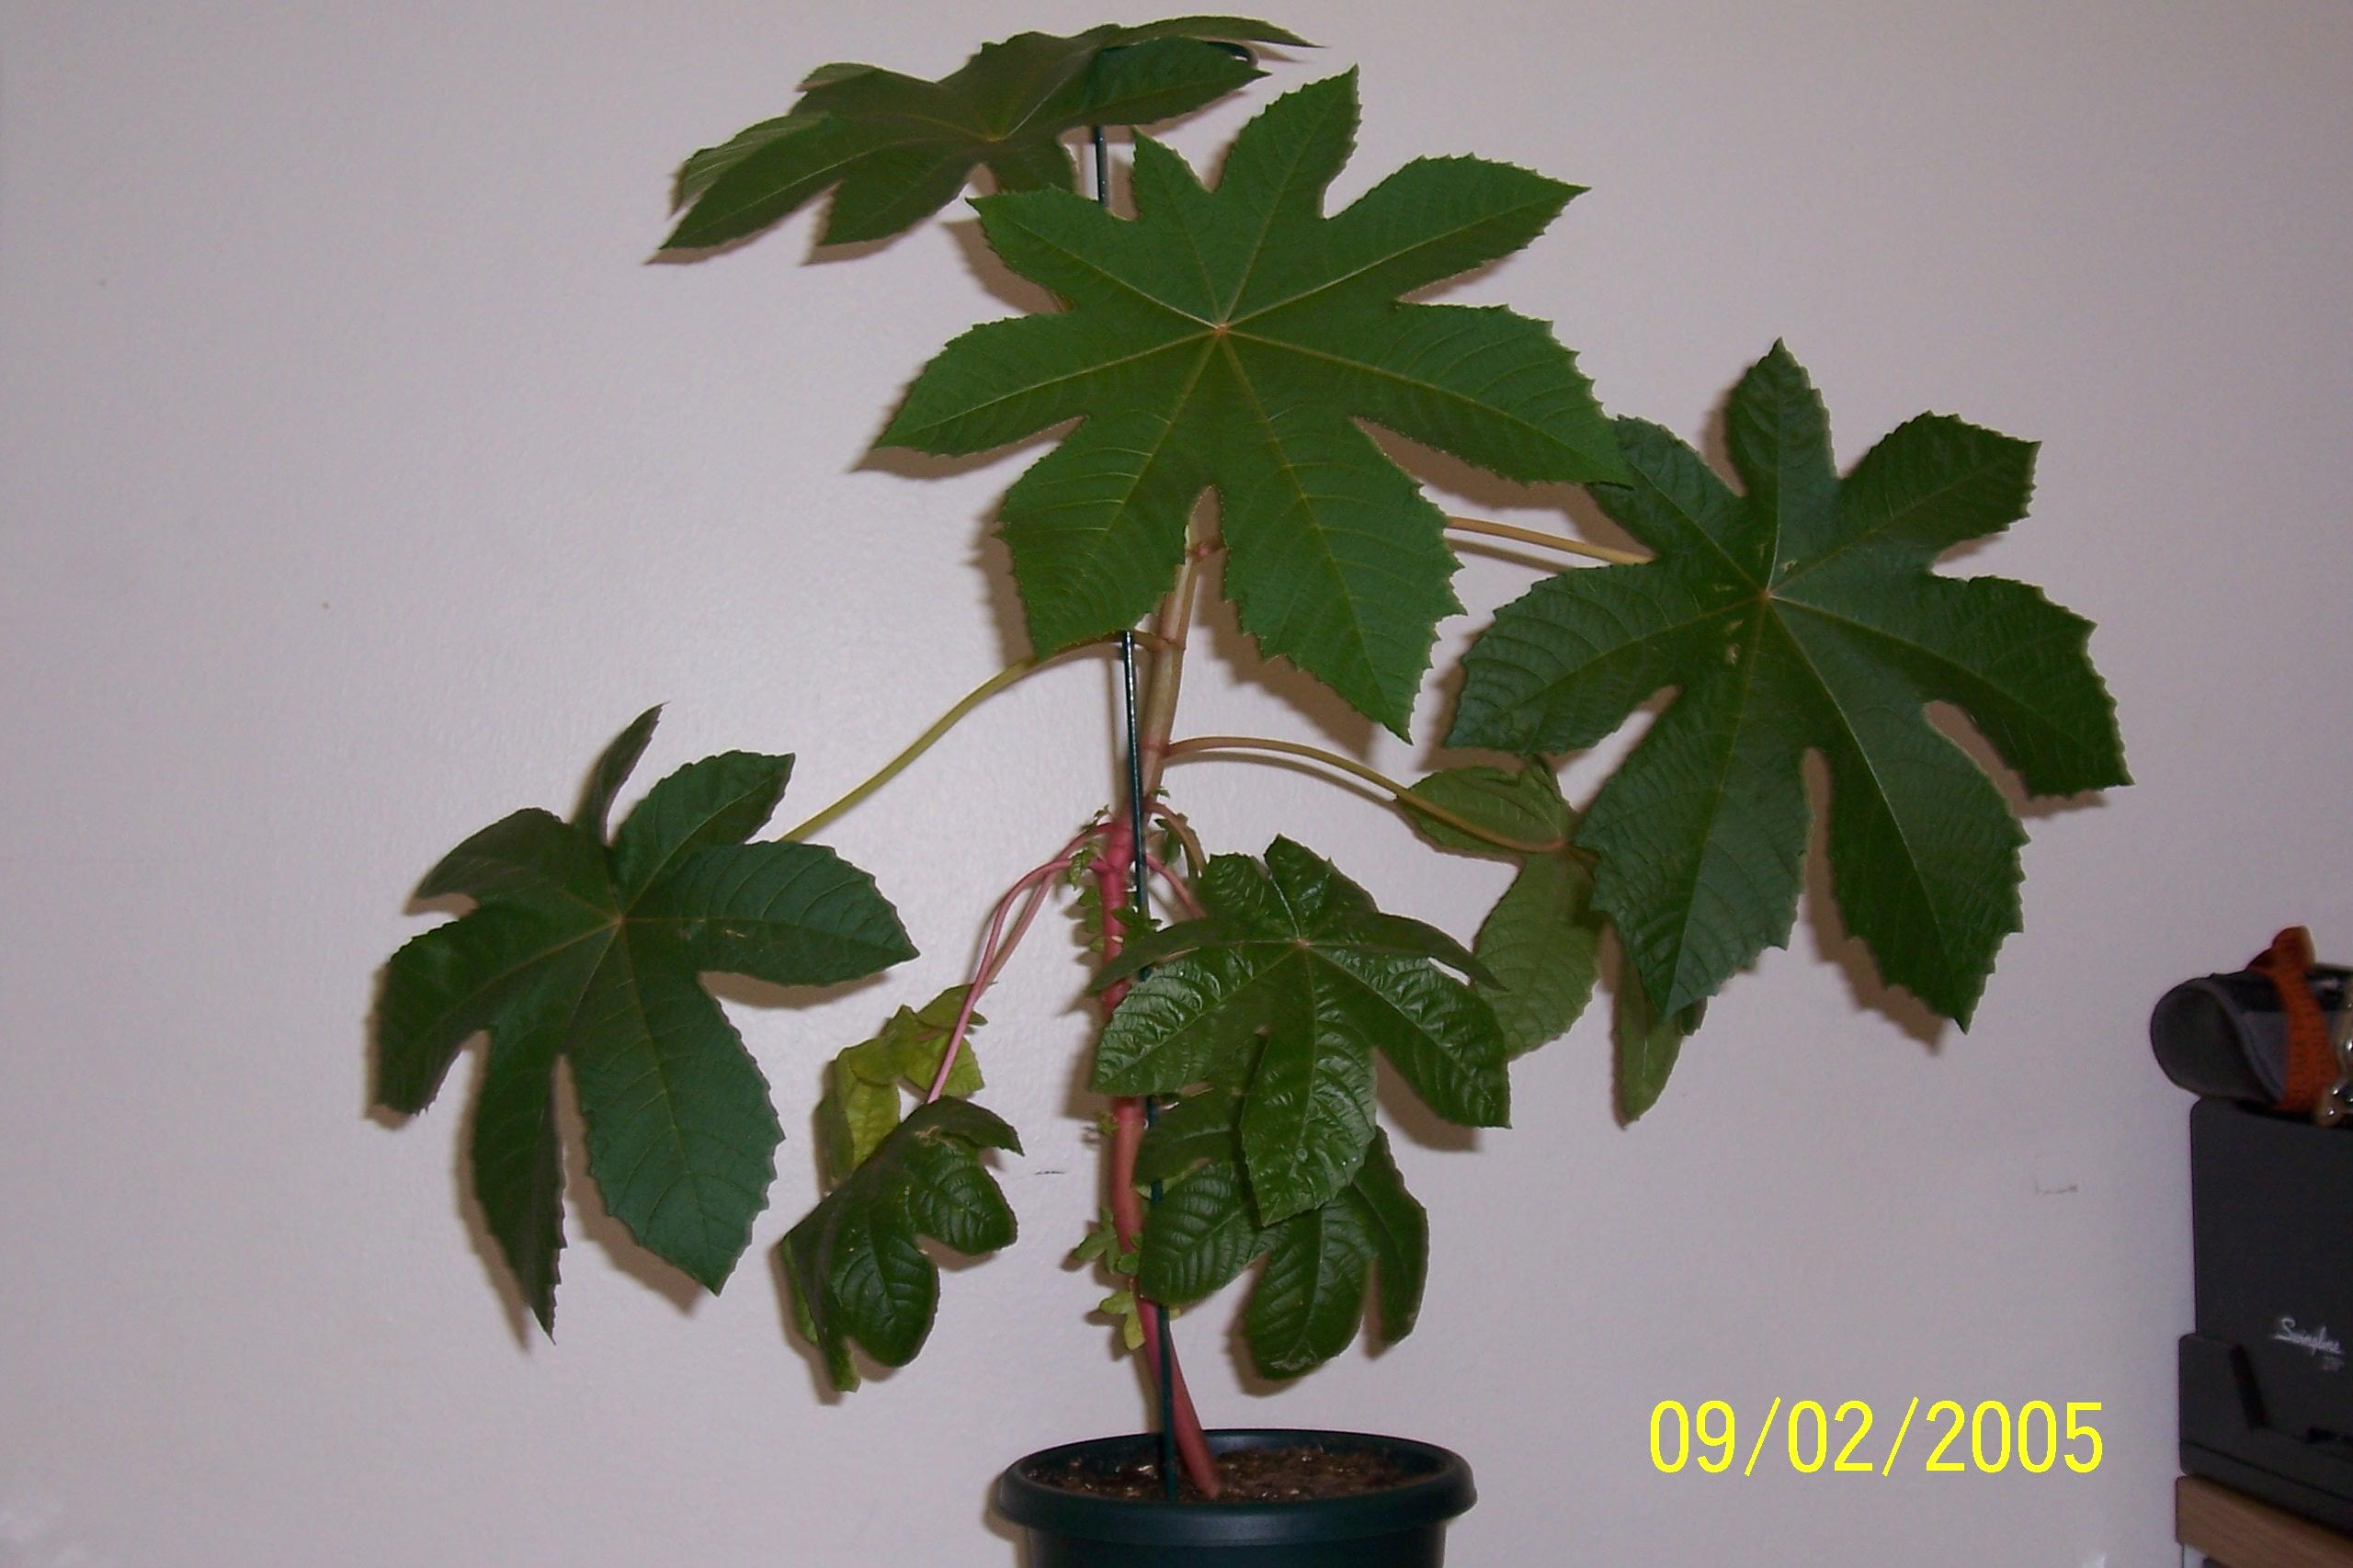 Castor bean plant image